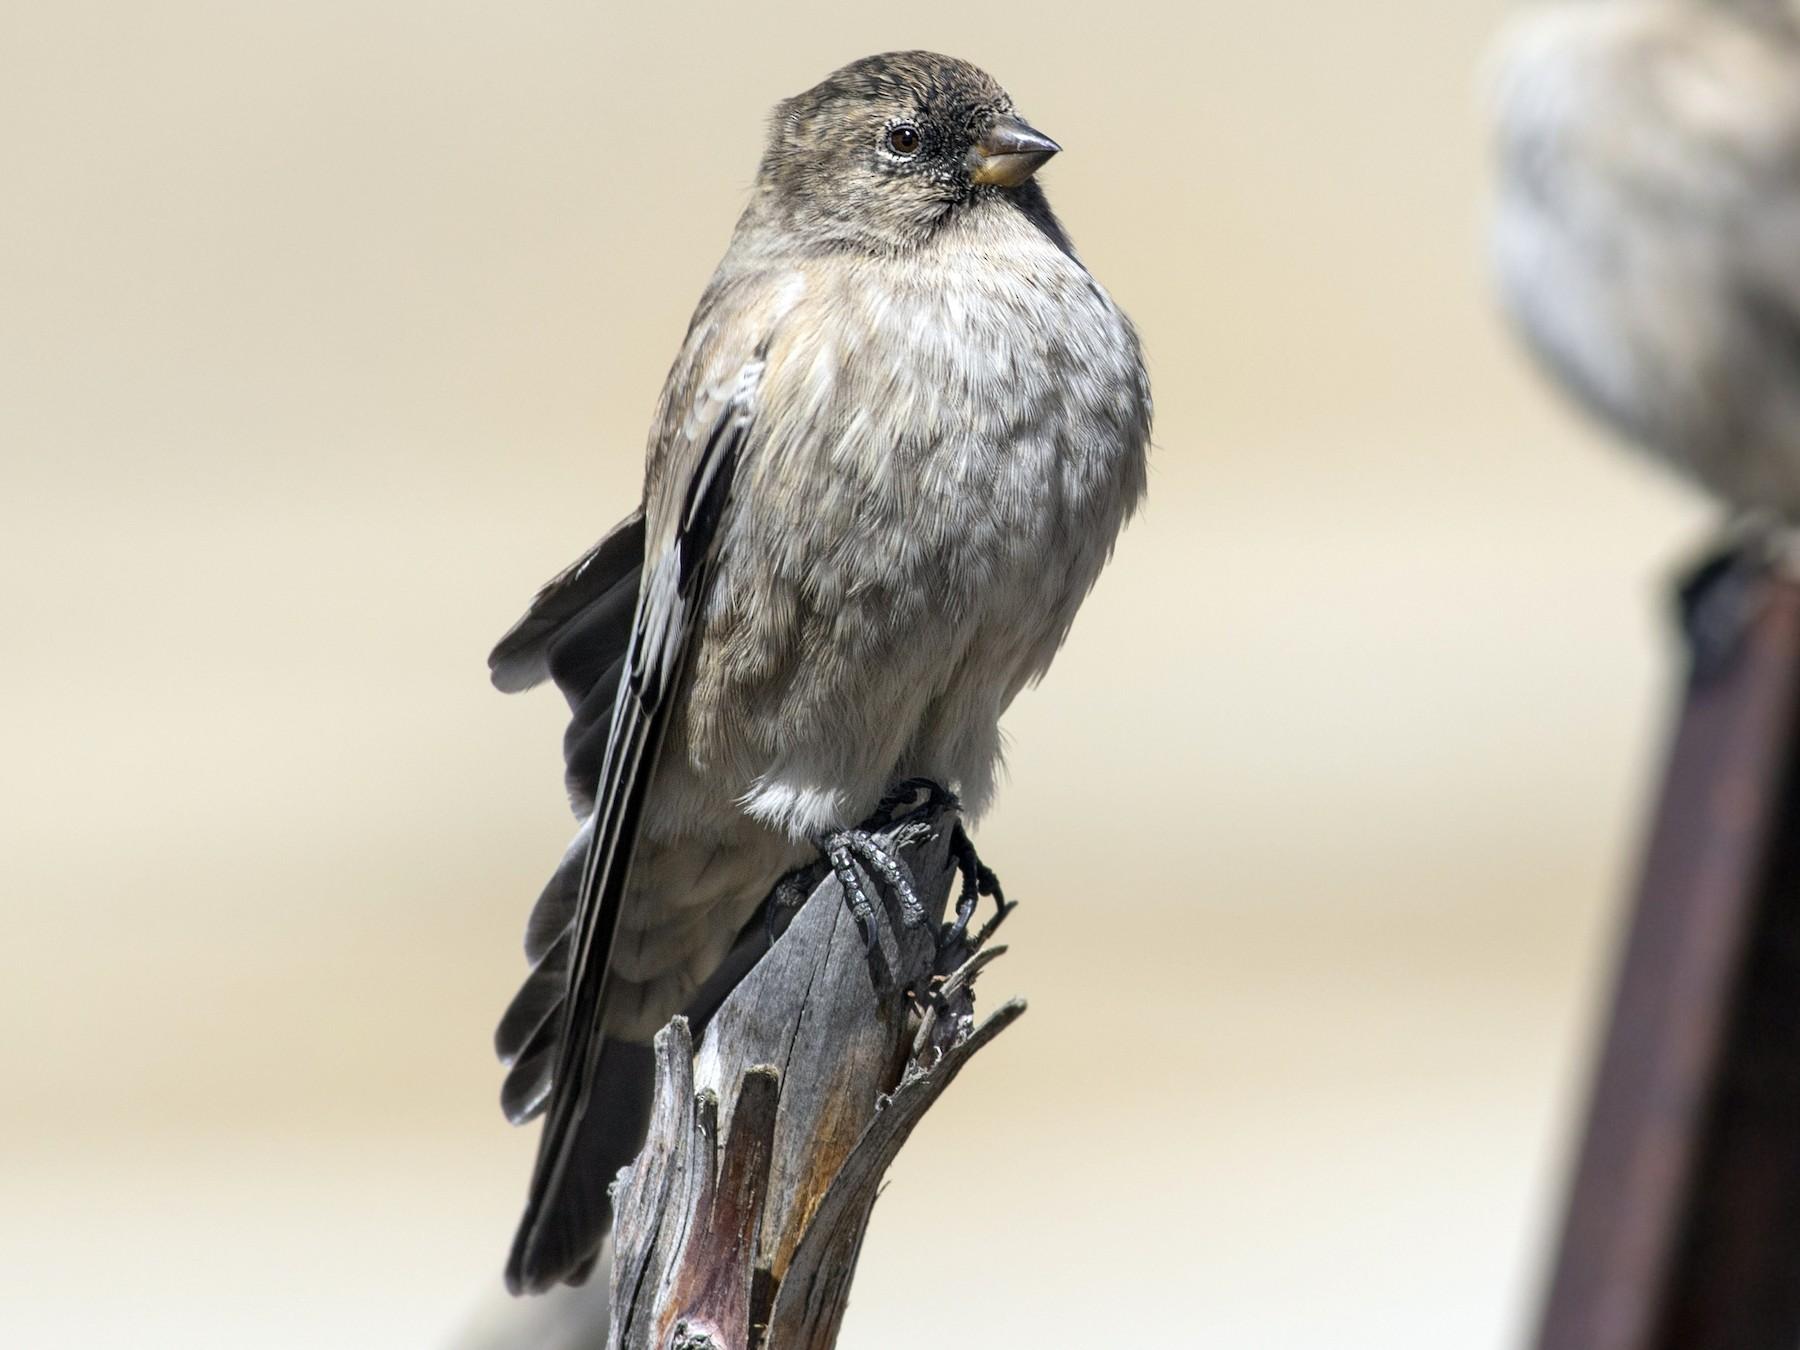 Black-headed Mountain-Finch - Rajdeep Mitra